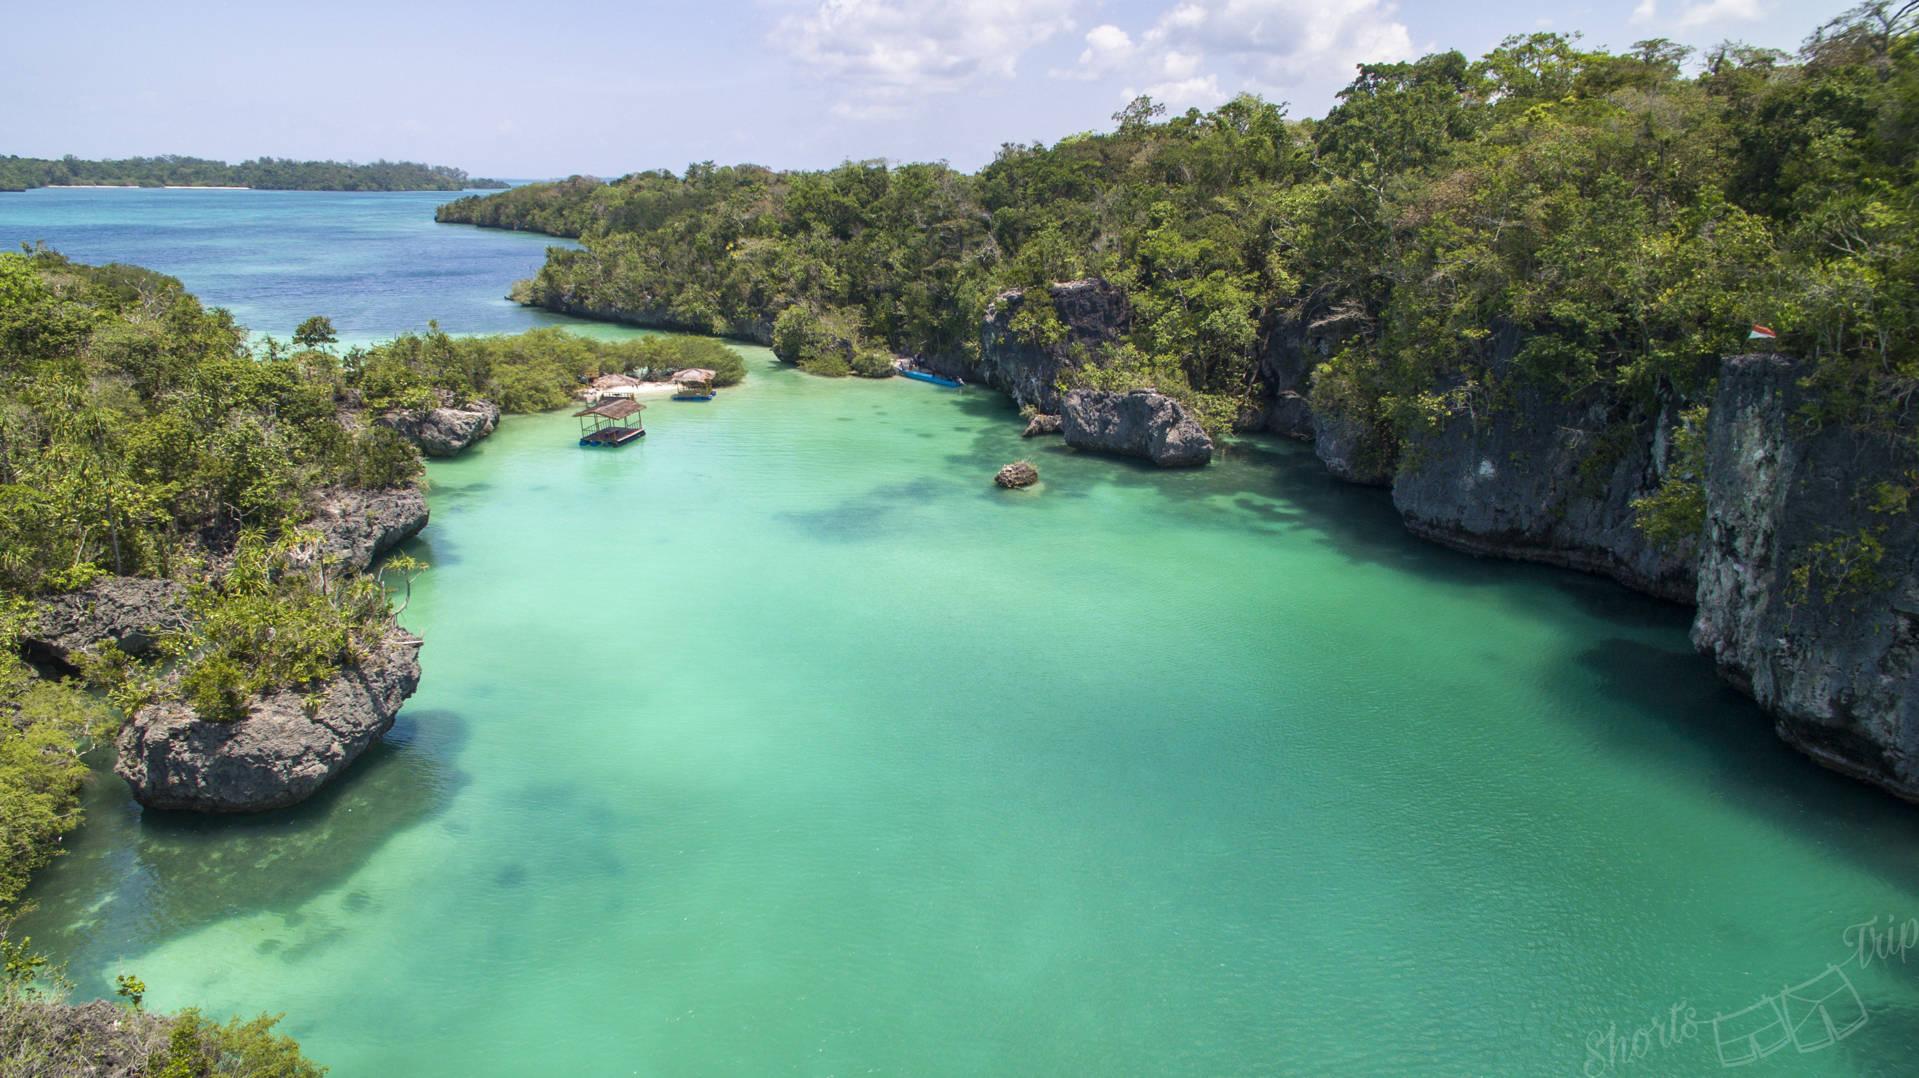 bair, bair lagoon, bair kei island, kei islands, kei bair lagoon, kei bair, how to get to bair, bair boat